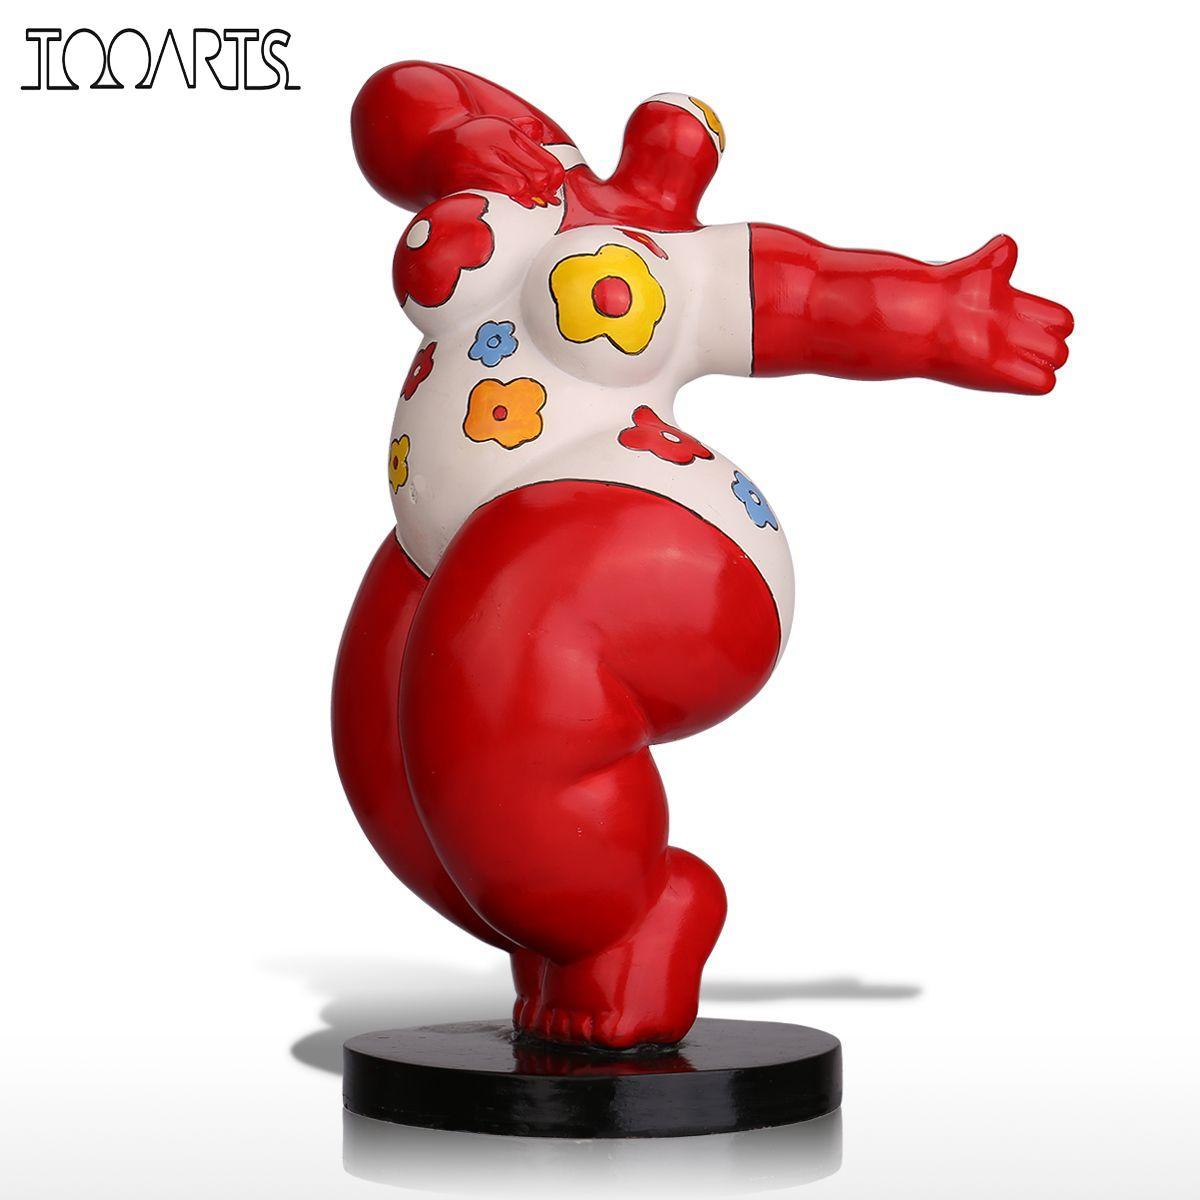 Tooarts Sculpture Dancing Fat Woman Fiberglass Sculpture Exaggerative Modeling Decorative Ornament For Home Office